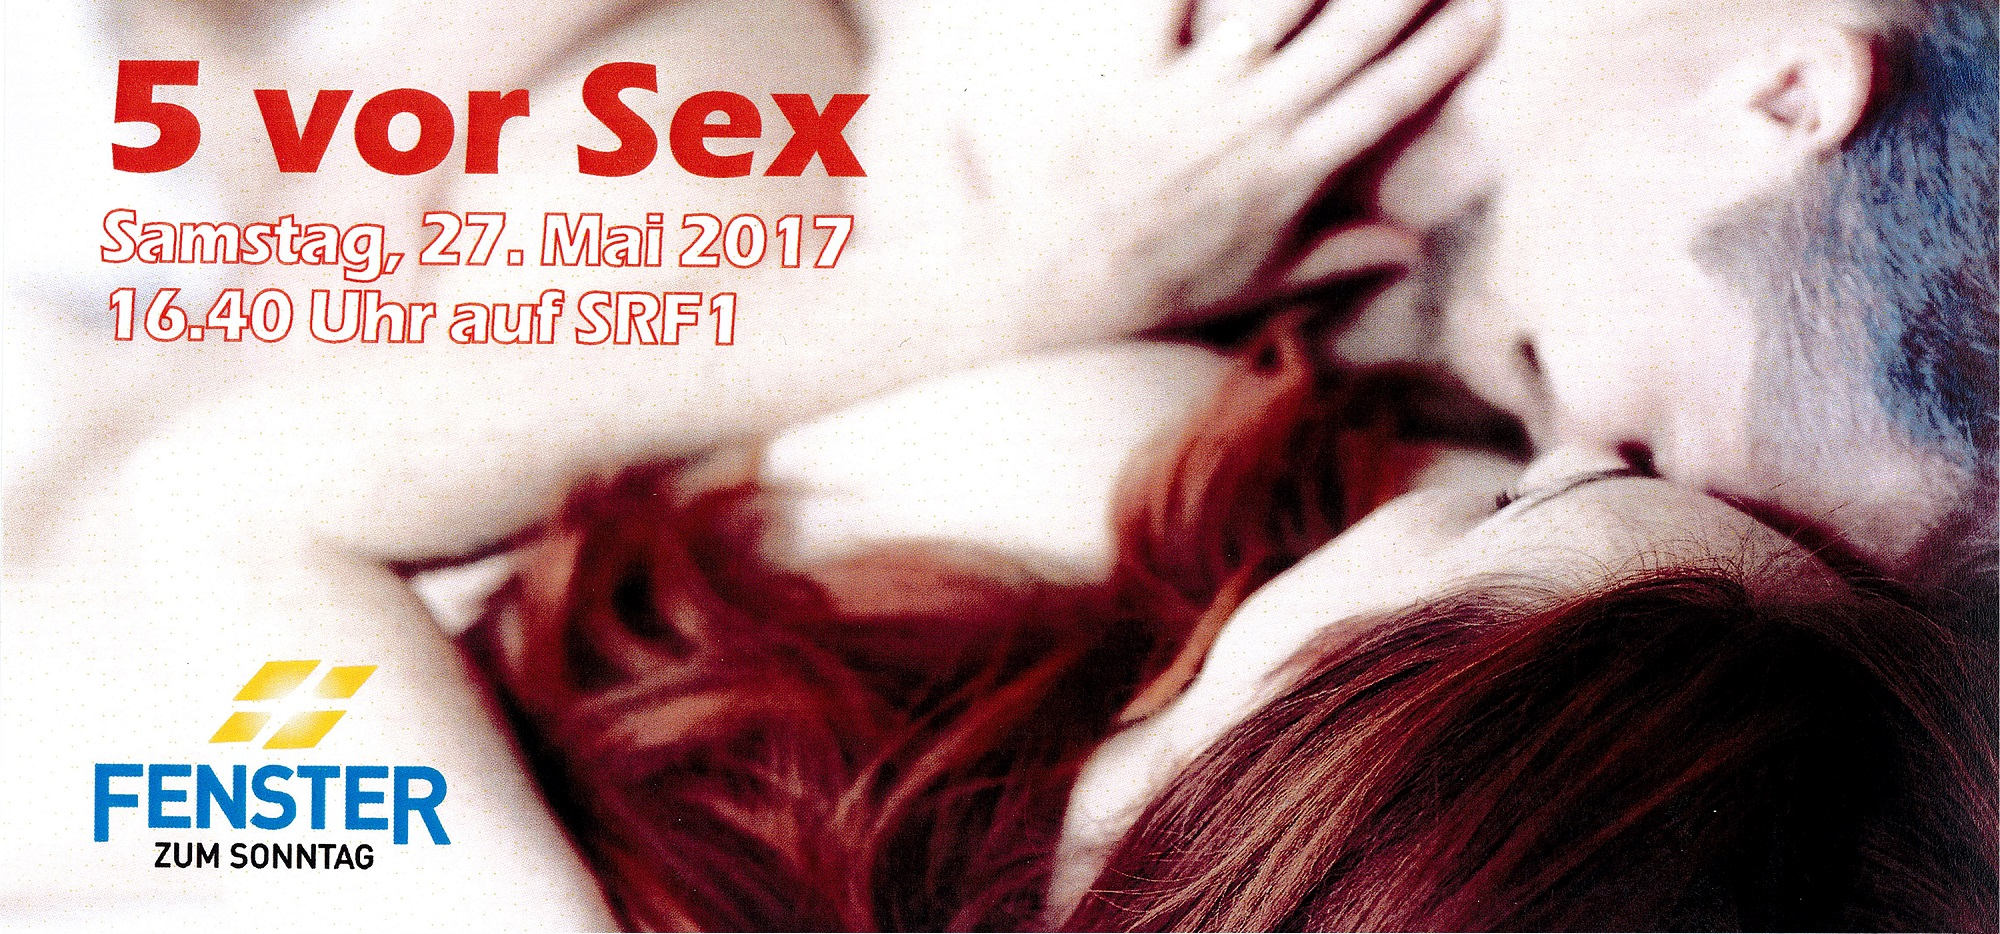 5_vor_Sex_Flyer.jpg